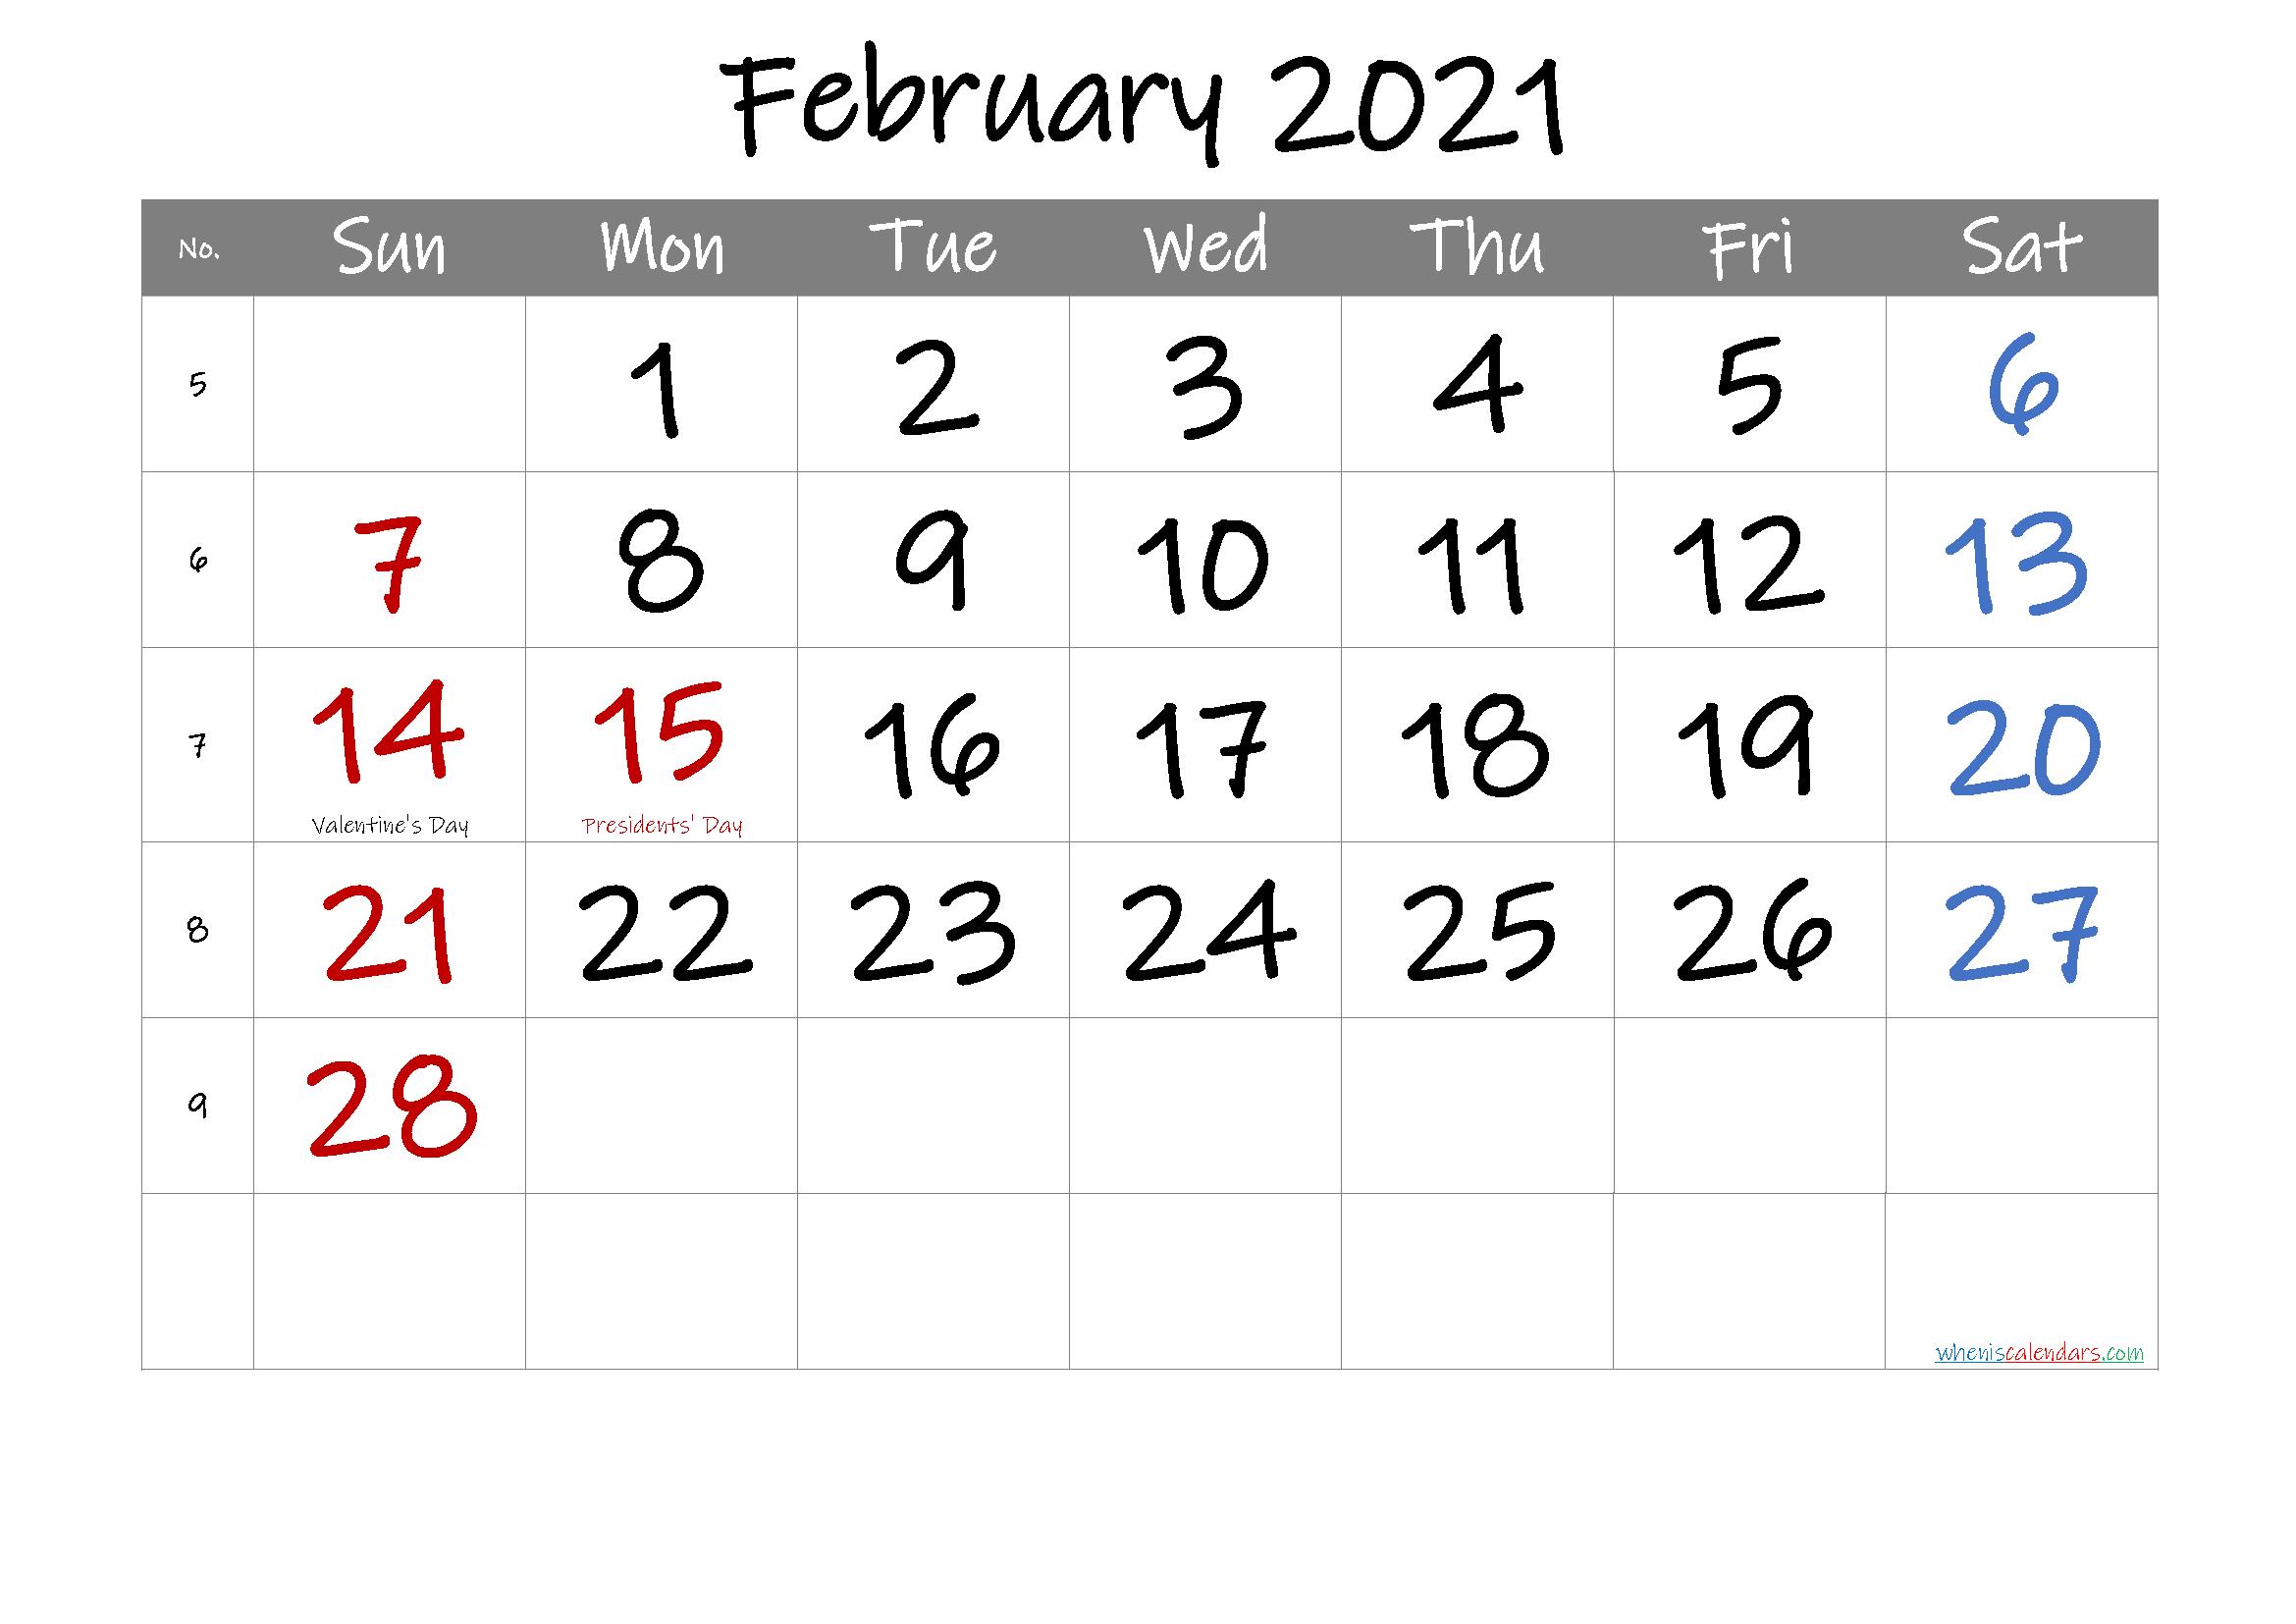 Free February 2021 Printable Calendar with Holidays